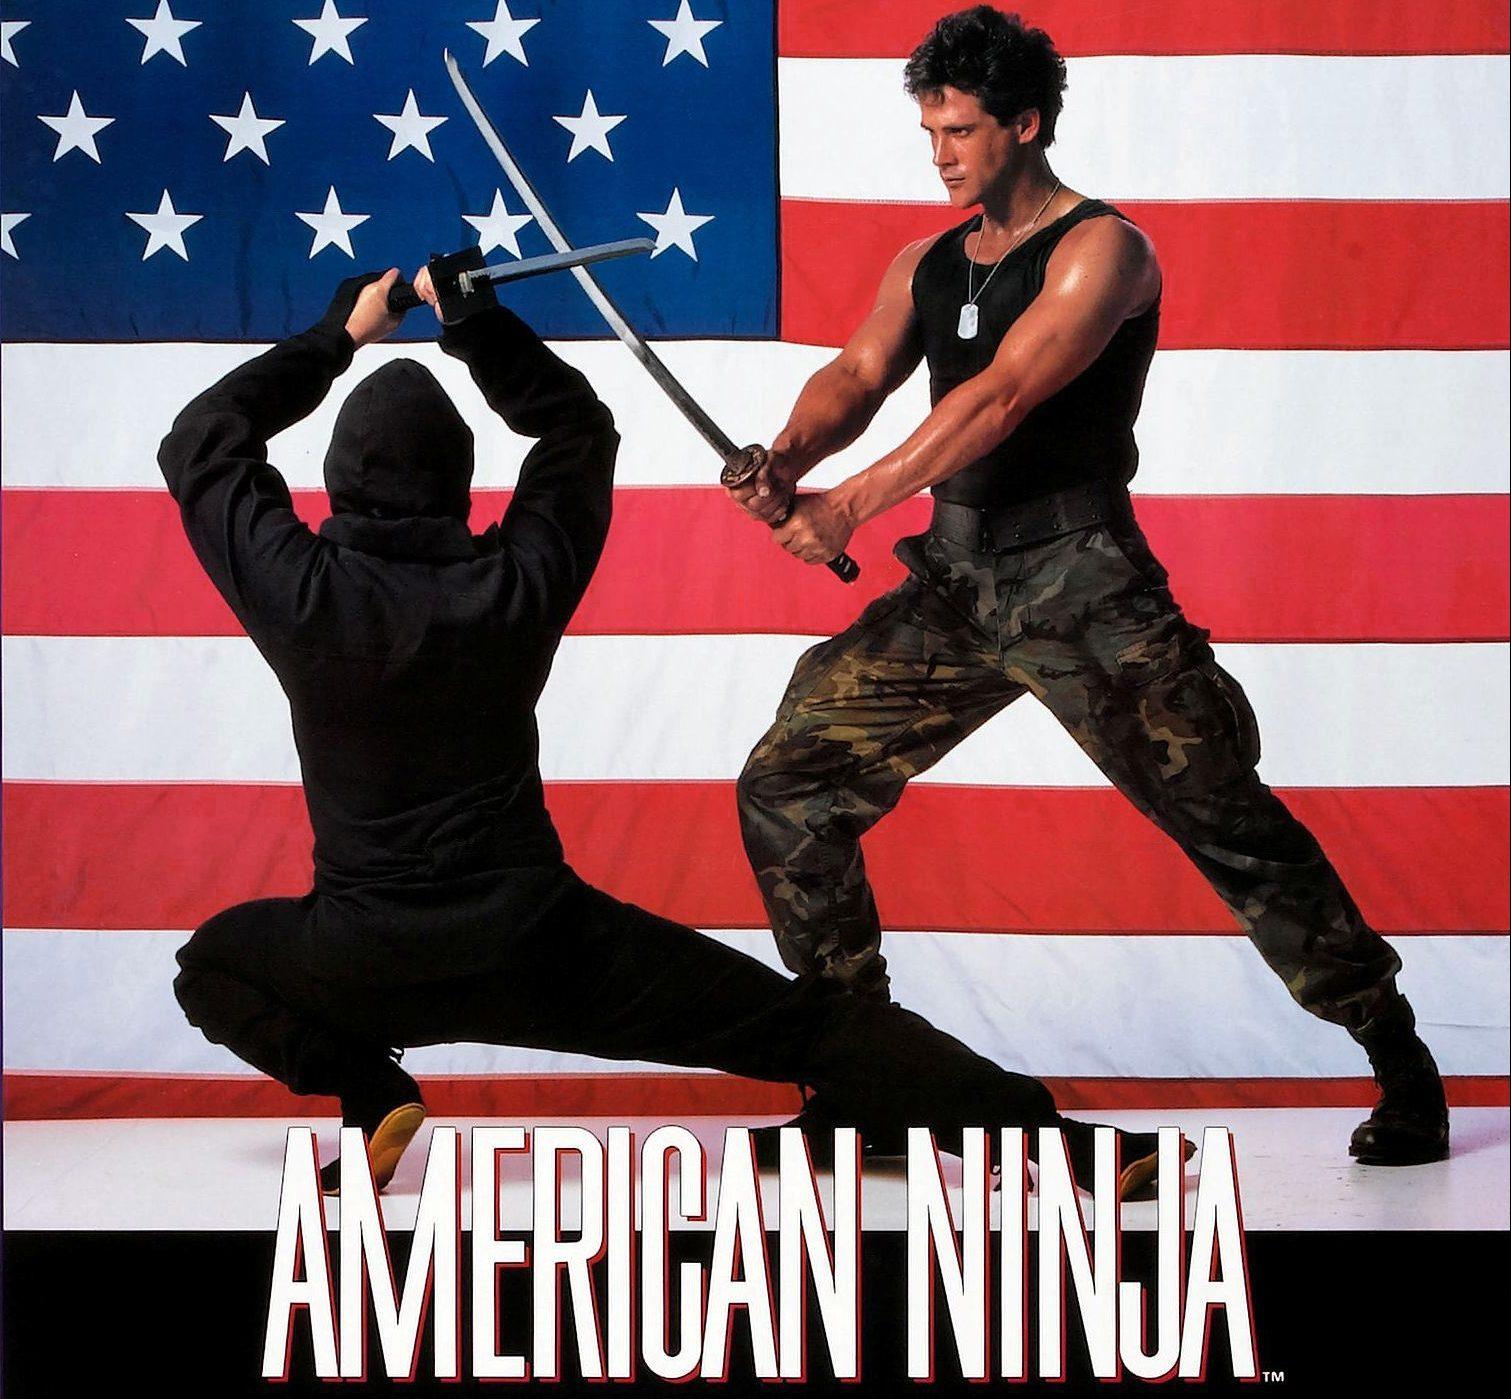 MV5BNjcxMzc5ZWQtN2Y2OS00NGNiLWE4MDYtMzAyYWJkN2YyODliXkEyXkFqcGdeQXVyMTQxNzMzNDI@. V1 e1619086603992 25 Crotch-Punching Facts About Jean-Claude Van Damme's 1988 Film Bloodsport